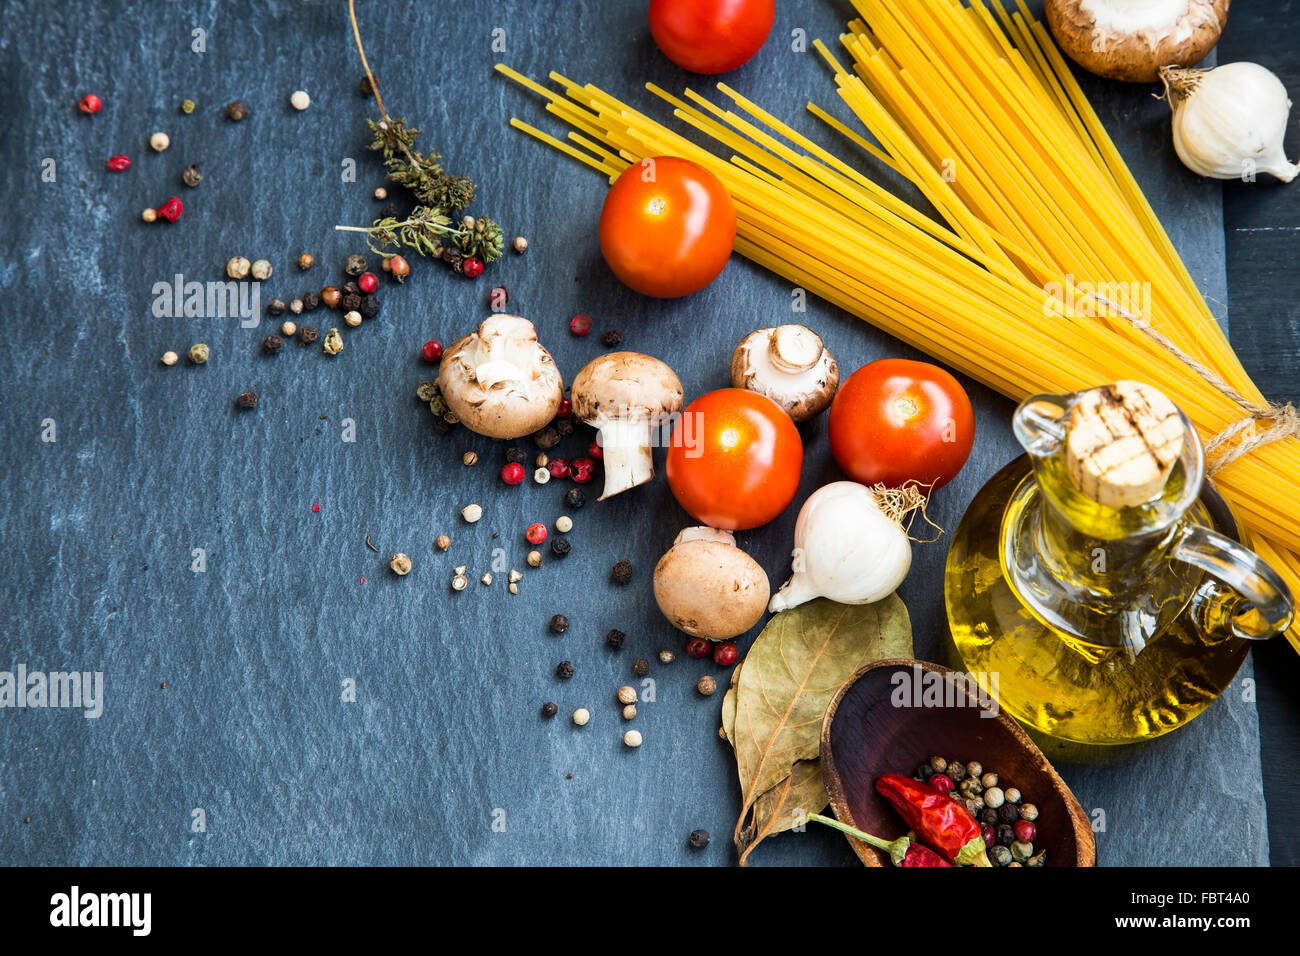 Pasto italiano ingredienti con pasta,spezie,pomodori,l'olio d'oliva,funghi Immagini Stock